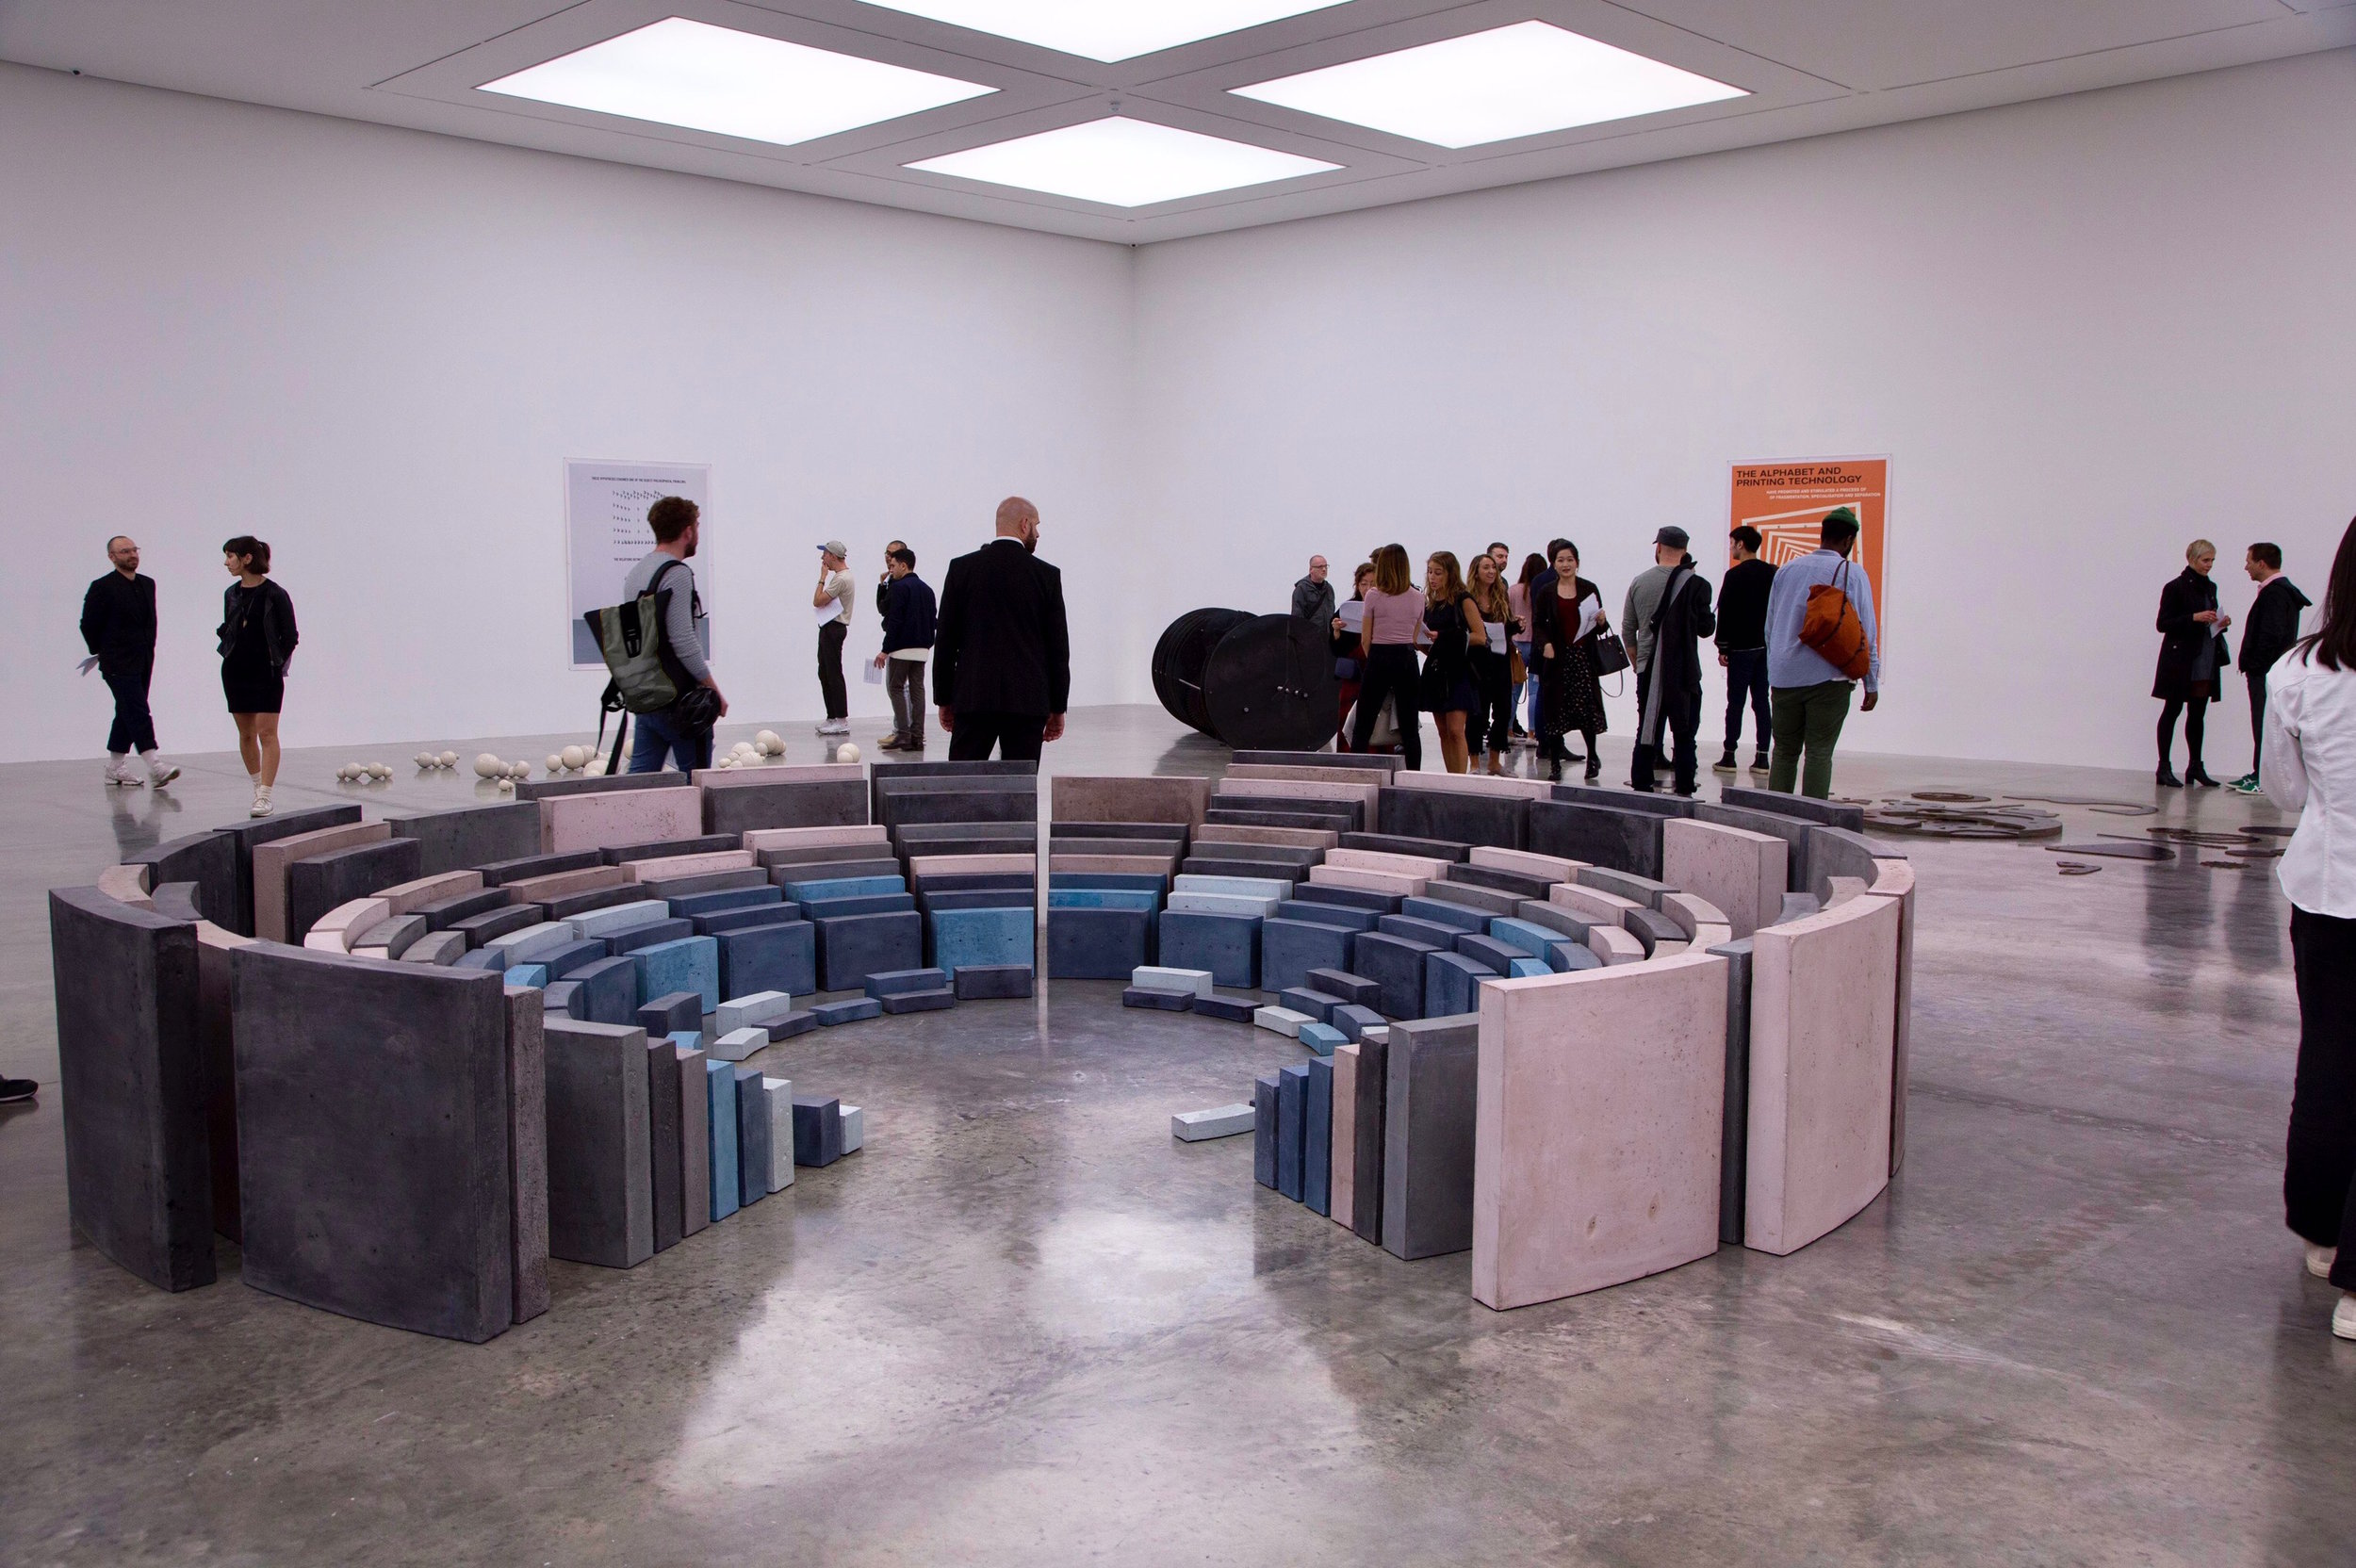 Damian Ortega's centre piece